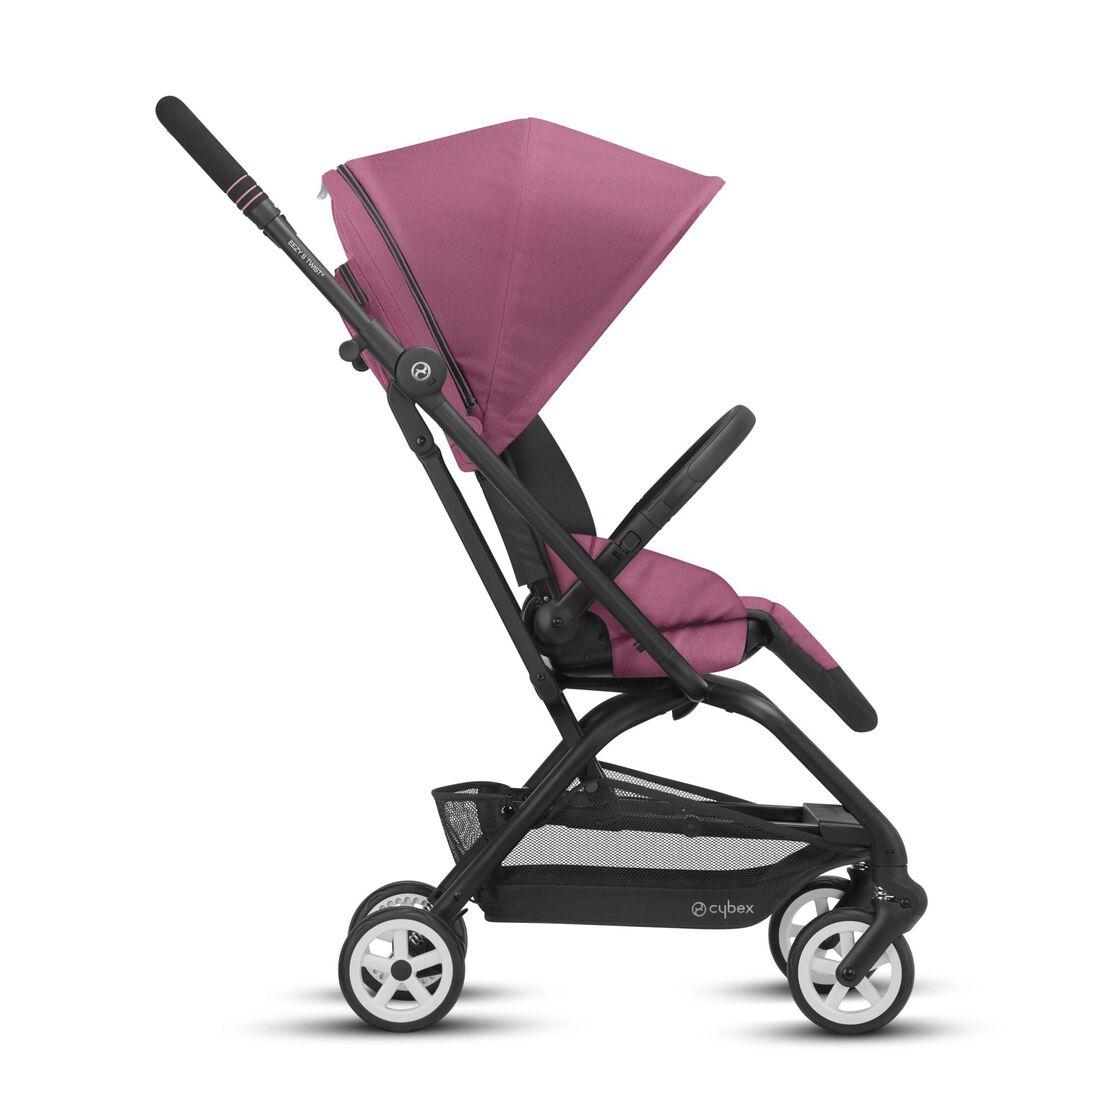 CYBEX Eezy S Twist 2 - Magnolia Pink (Black Frame) in Magnolia Pink (Black Frame) large image number 2